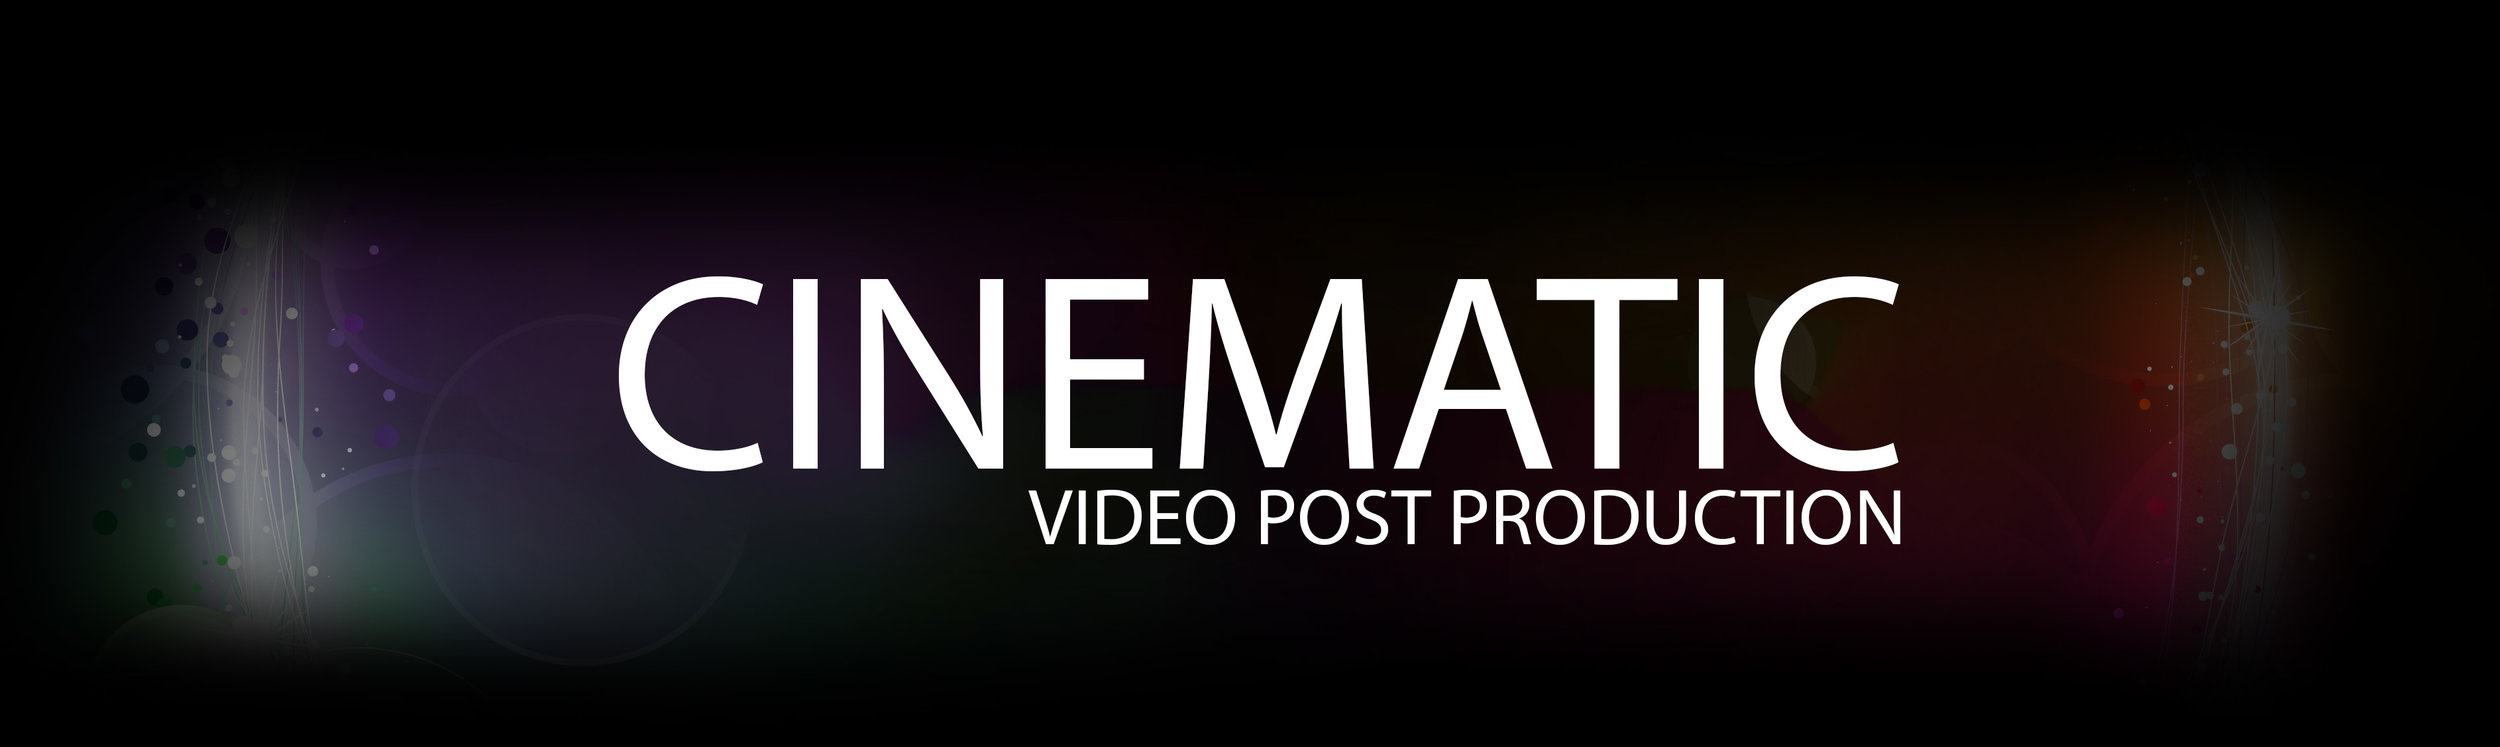 Cinemattic Logo wide.jpg